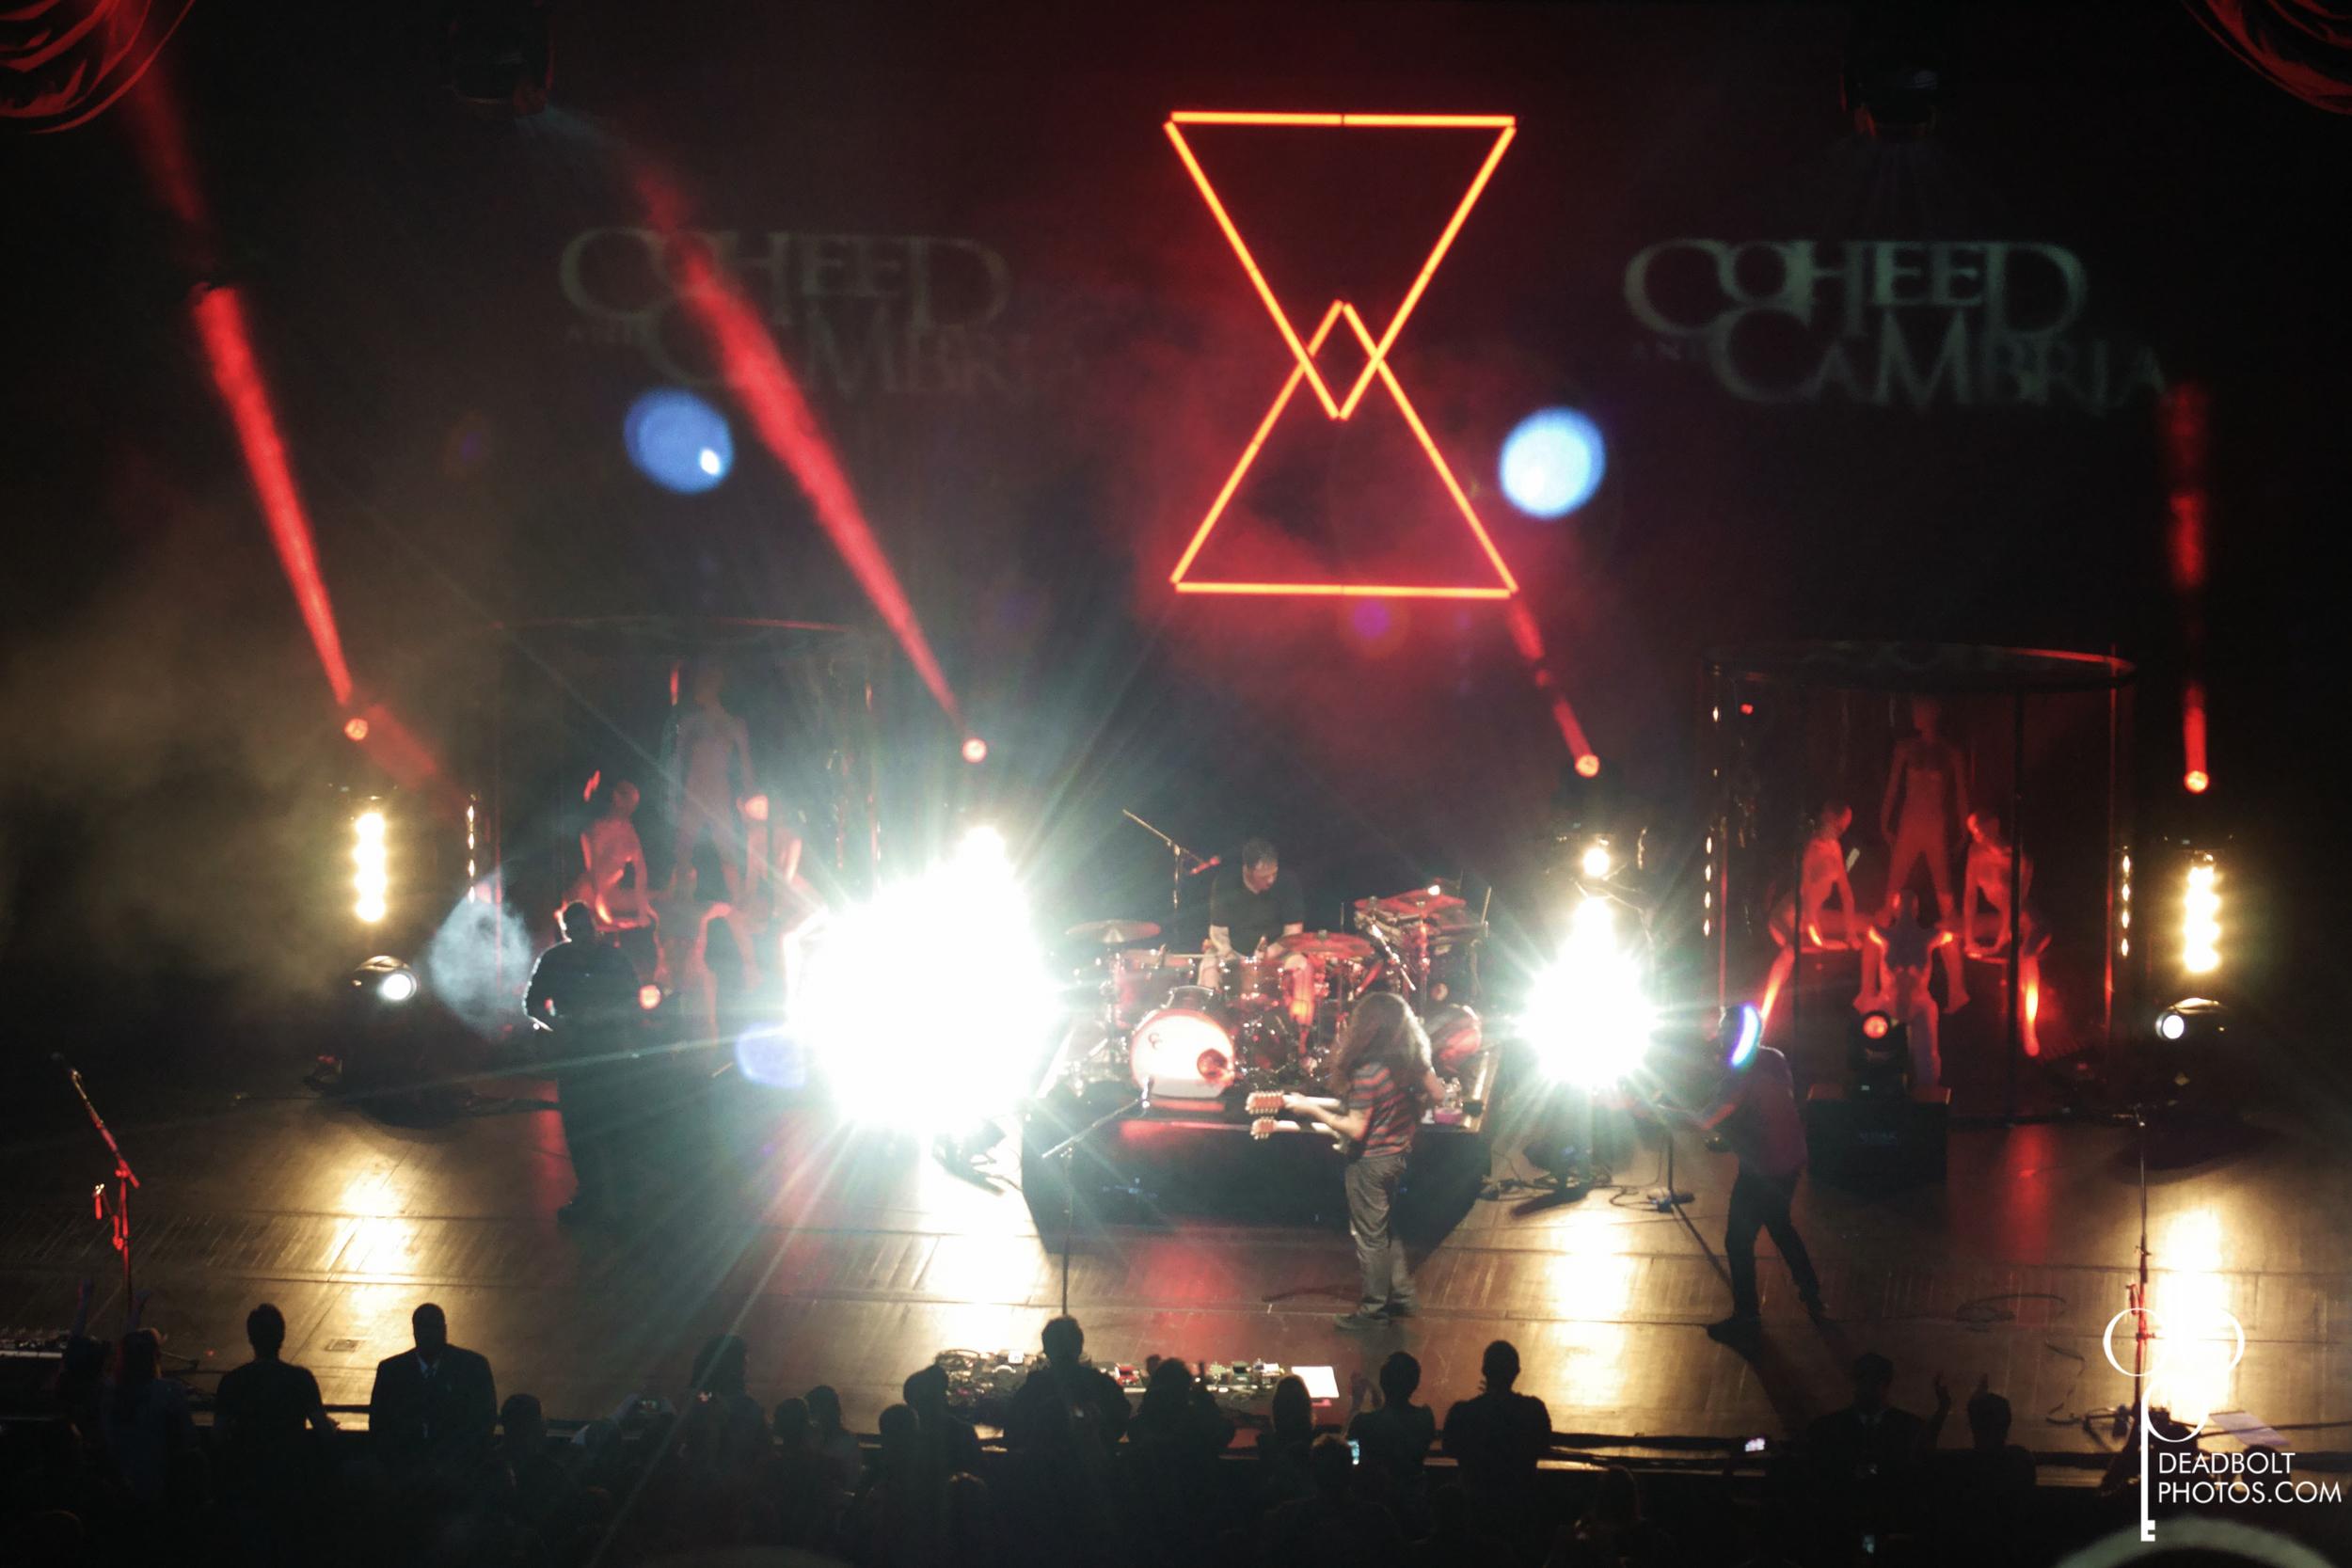 Coheed and Cambria at Radio City Music Hall